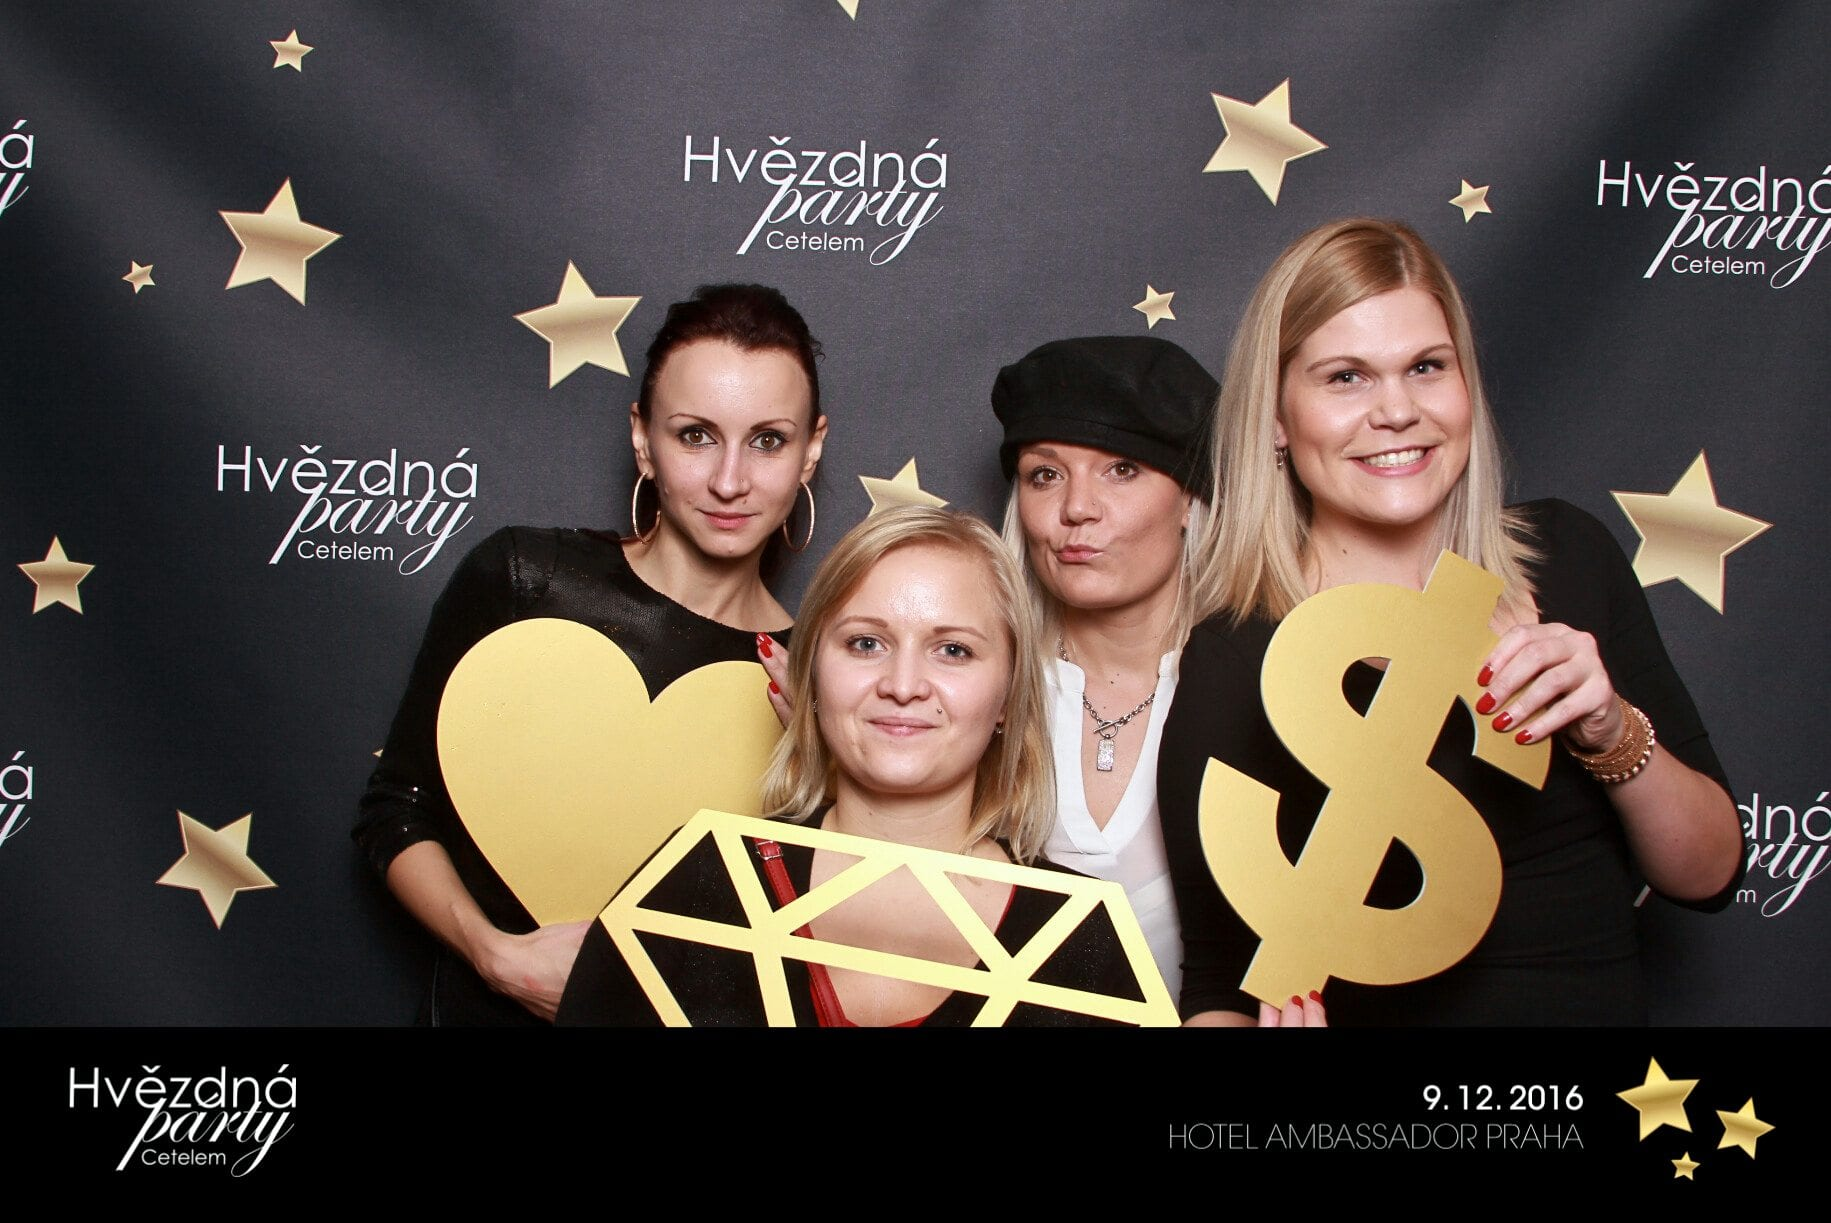 fotokoutek-hvezdna-party-cetelem-9-12-2016-178845